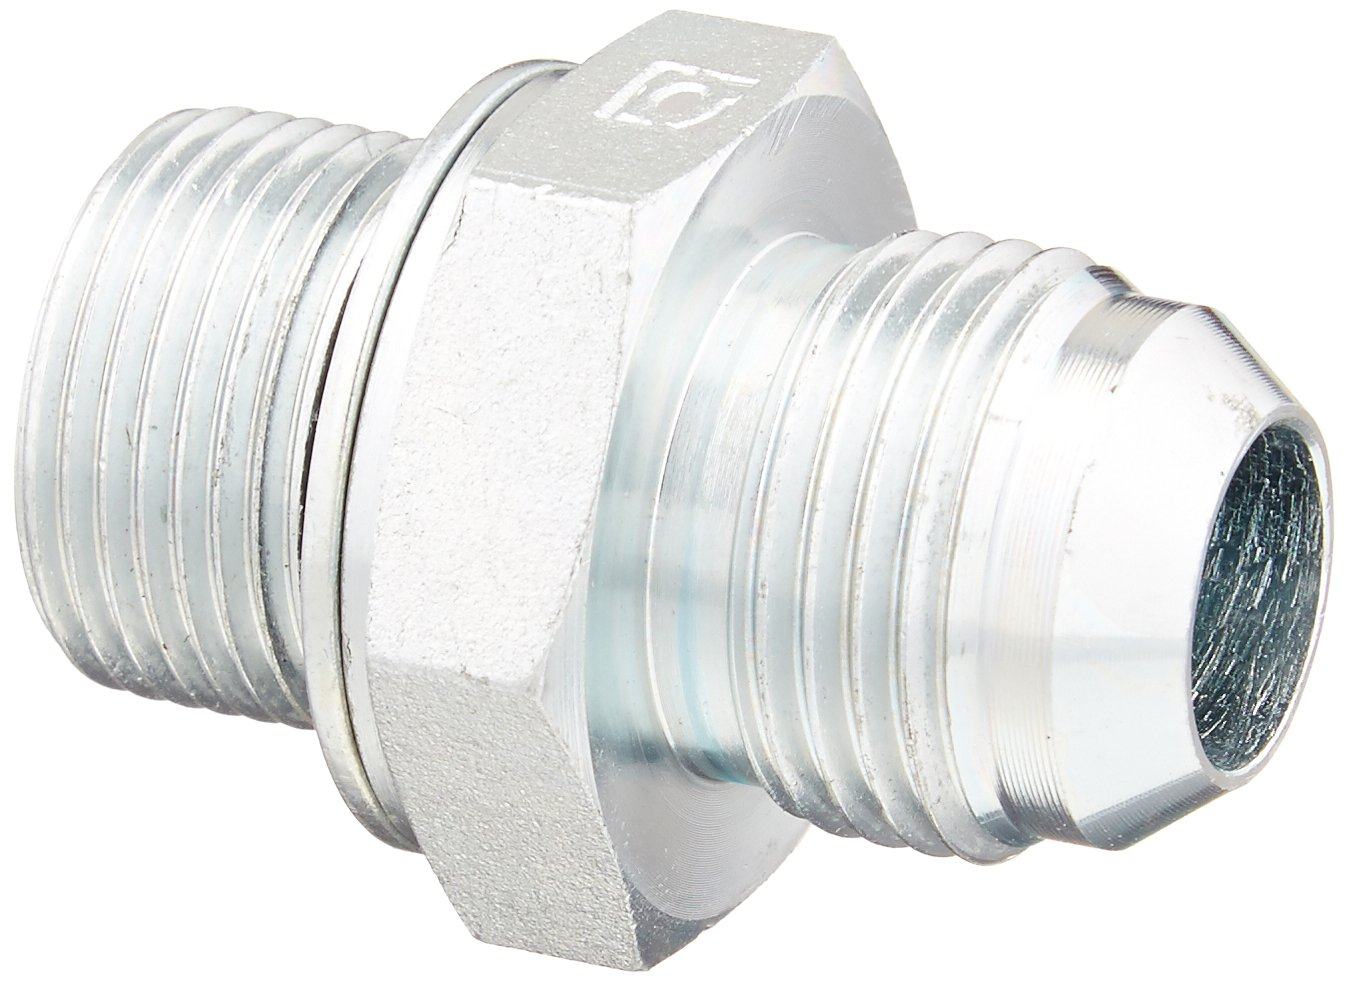 Eaton Aeroquip GG108-NP10-22 Male JIC to Male Straight Thread Connector, Metric, JIC 37° & Metric End Types, Steel, 7/8 JIC(m) x M22(m) End Size, 5/8'' Tube OD